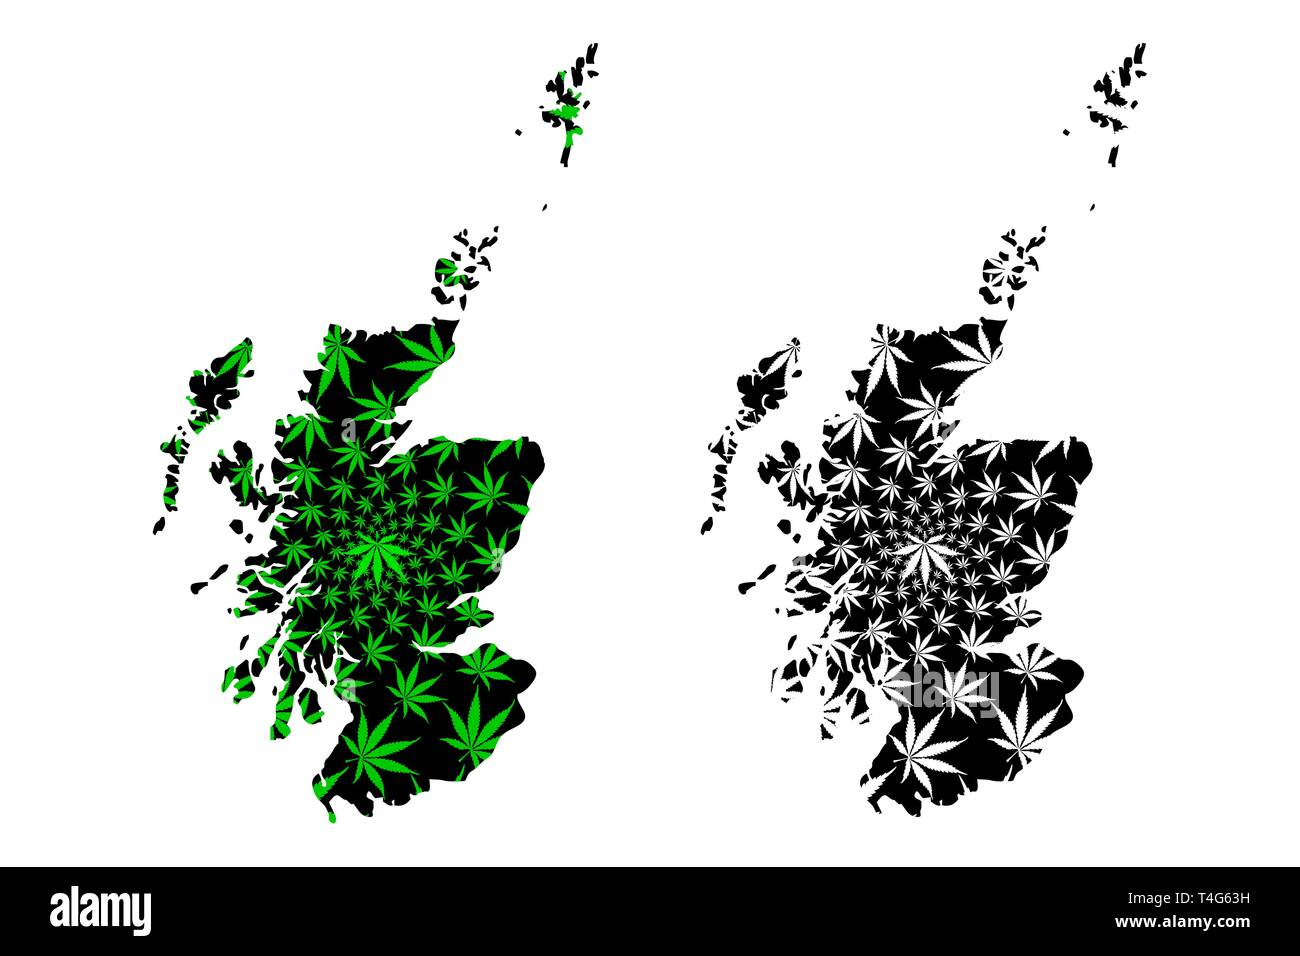 Scotland - map is designed cannabis leaf green and black, Scotland map made of marijuana (marihuana,THC) foliage, - Stock Vector